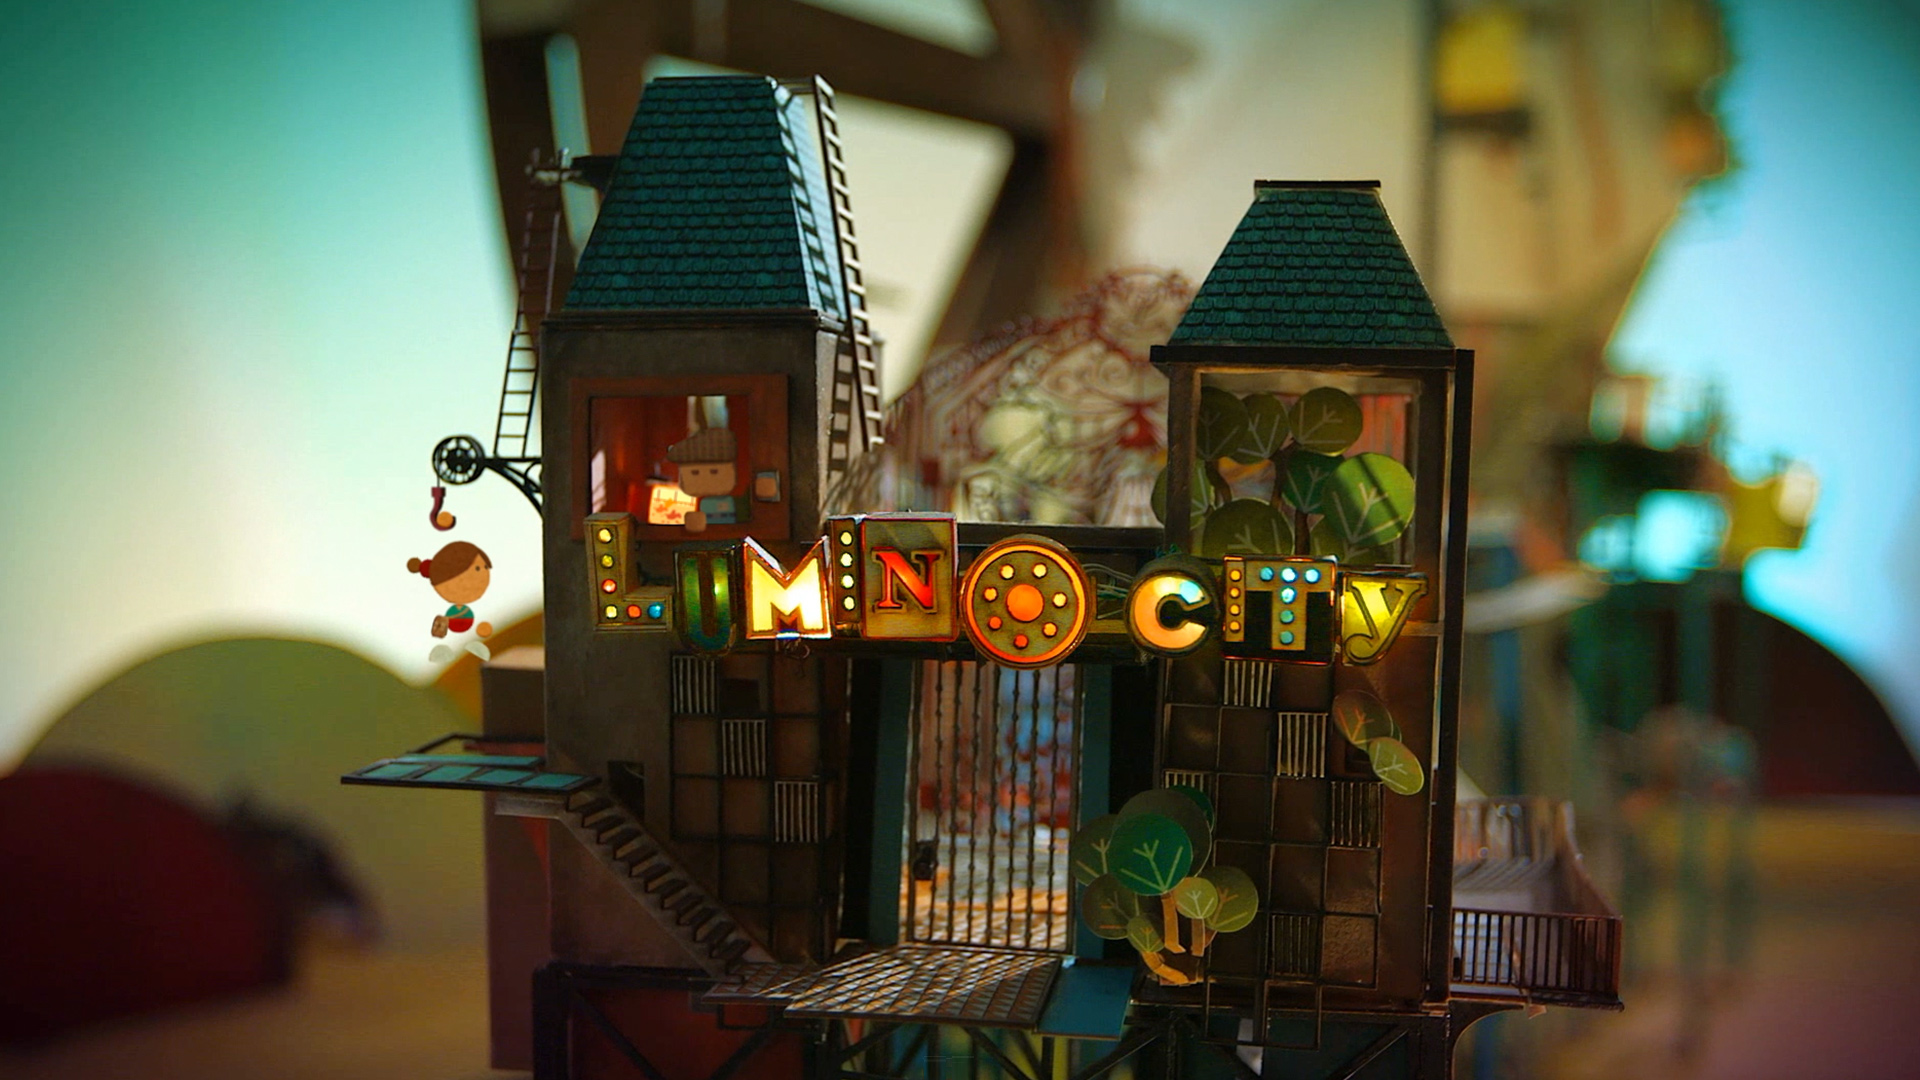 Lumino City for iOS: Prepare to explore a garden in the sky